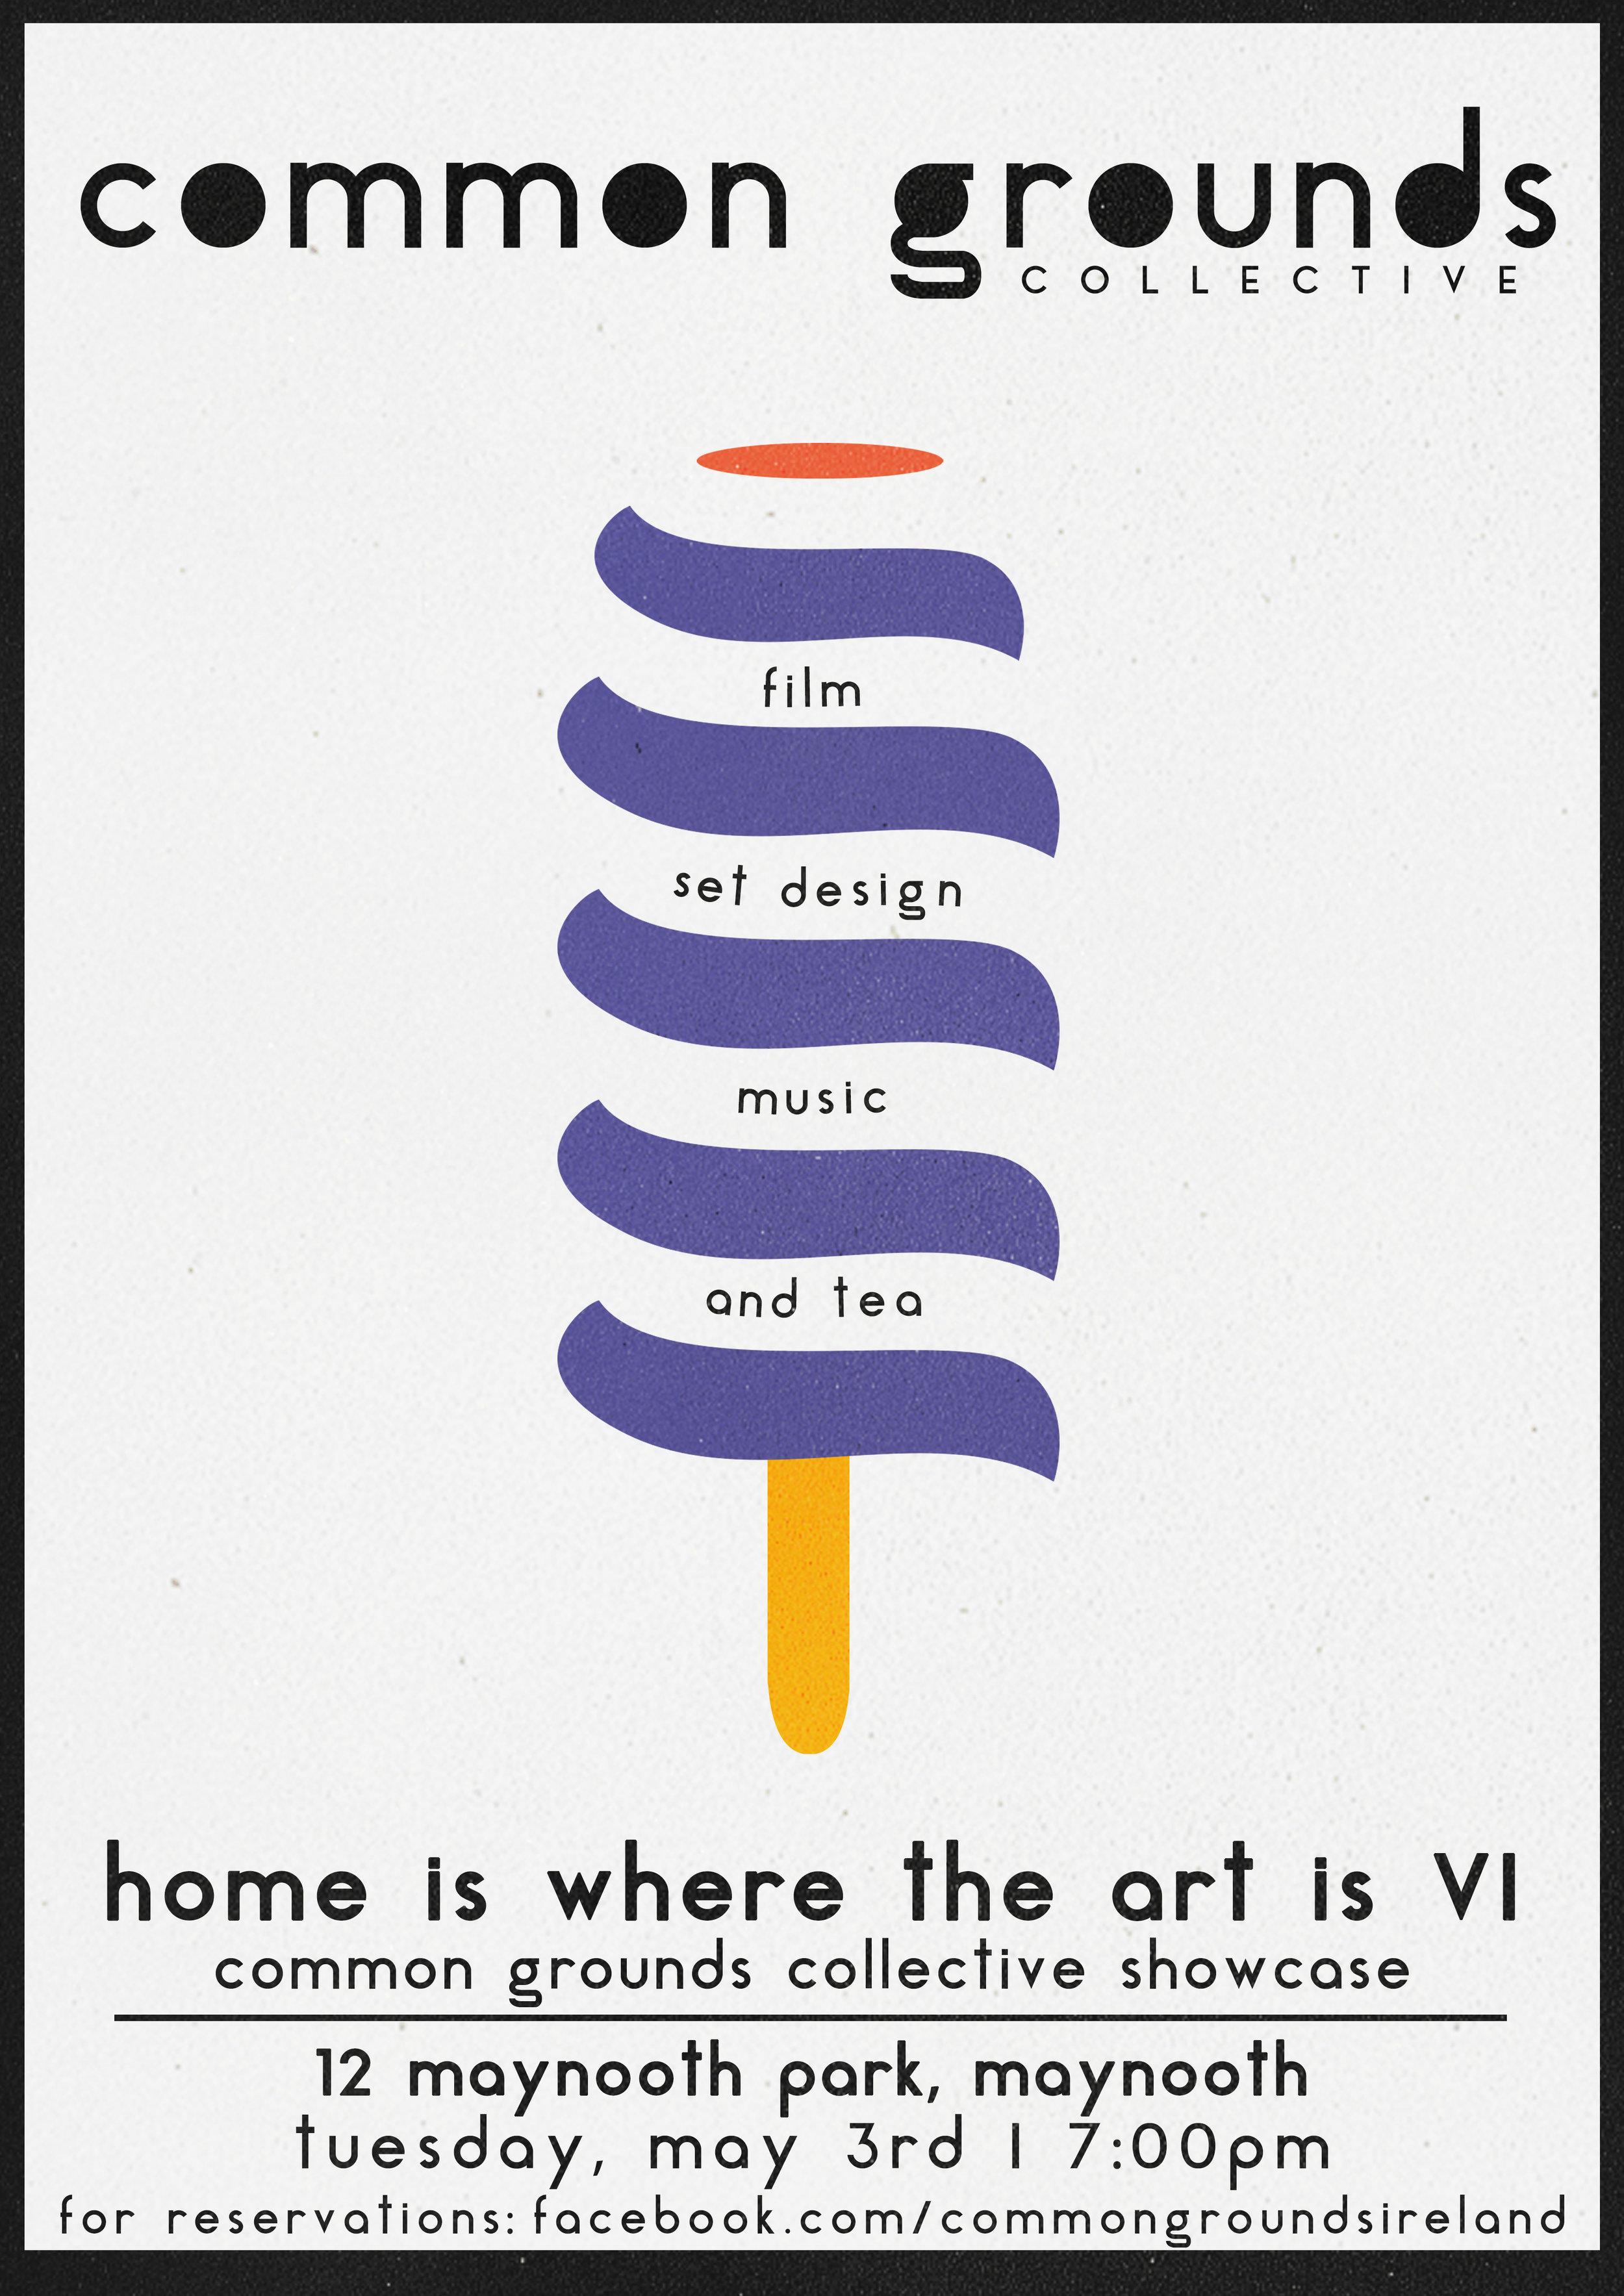 Home is Where the Art is VI Lauren Varian